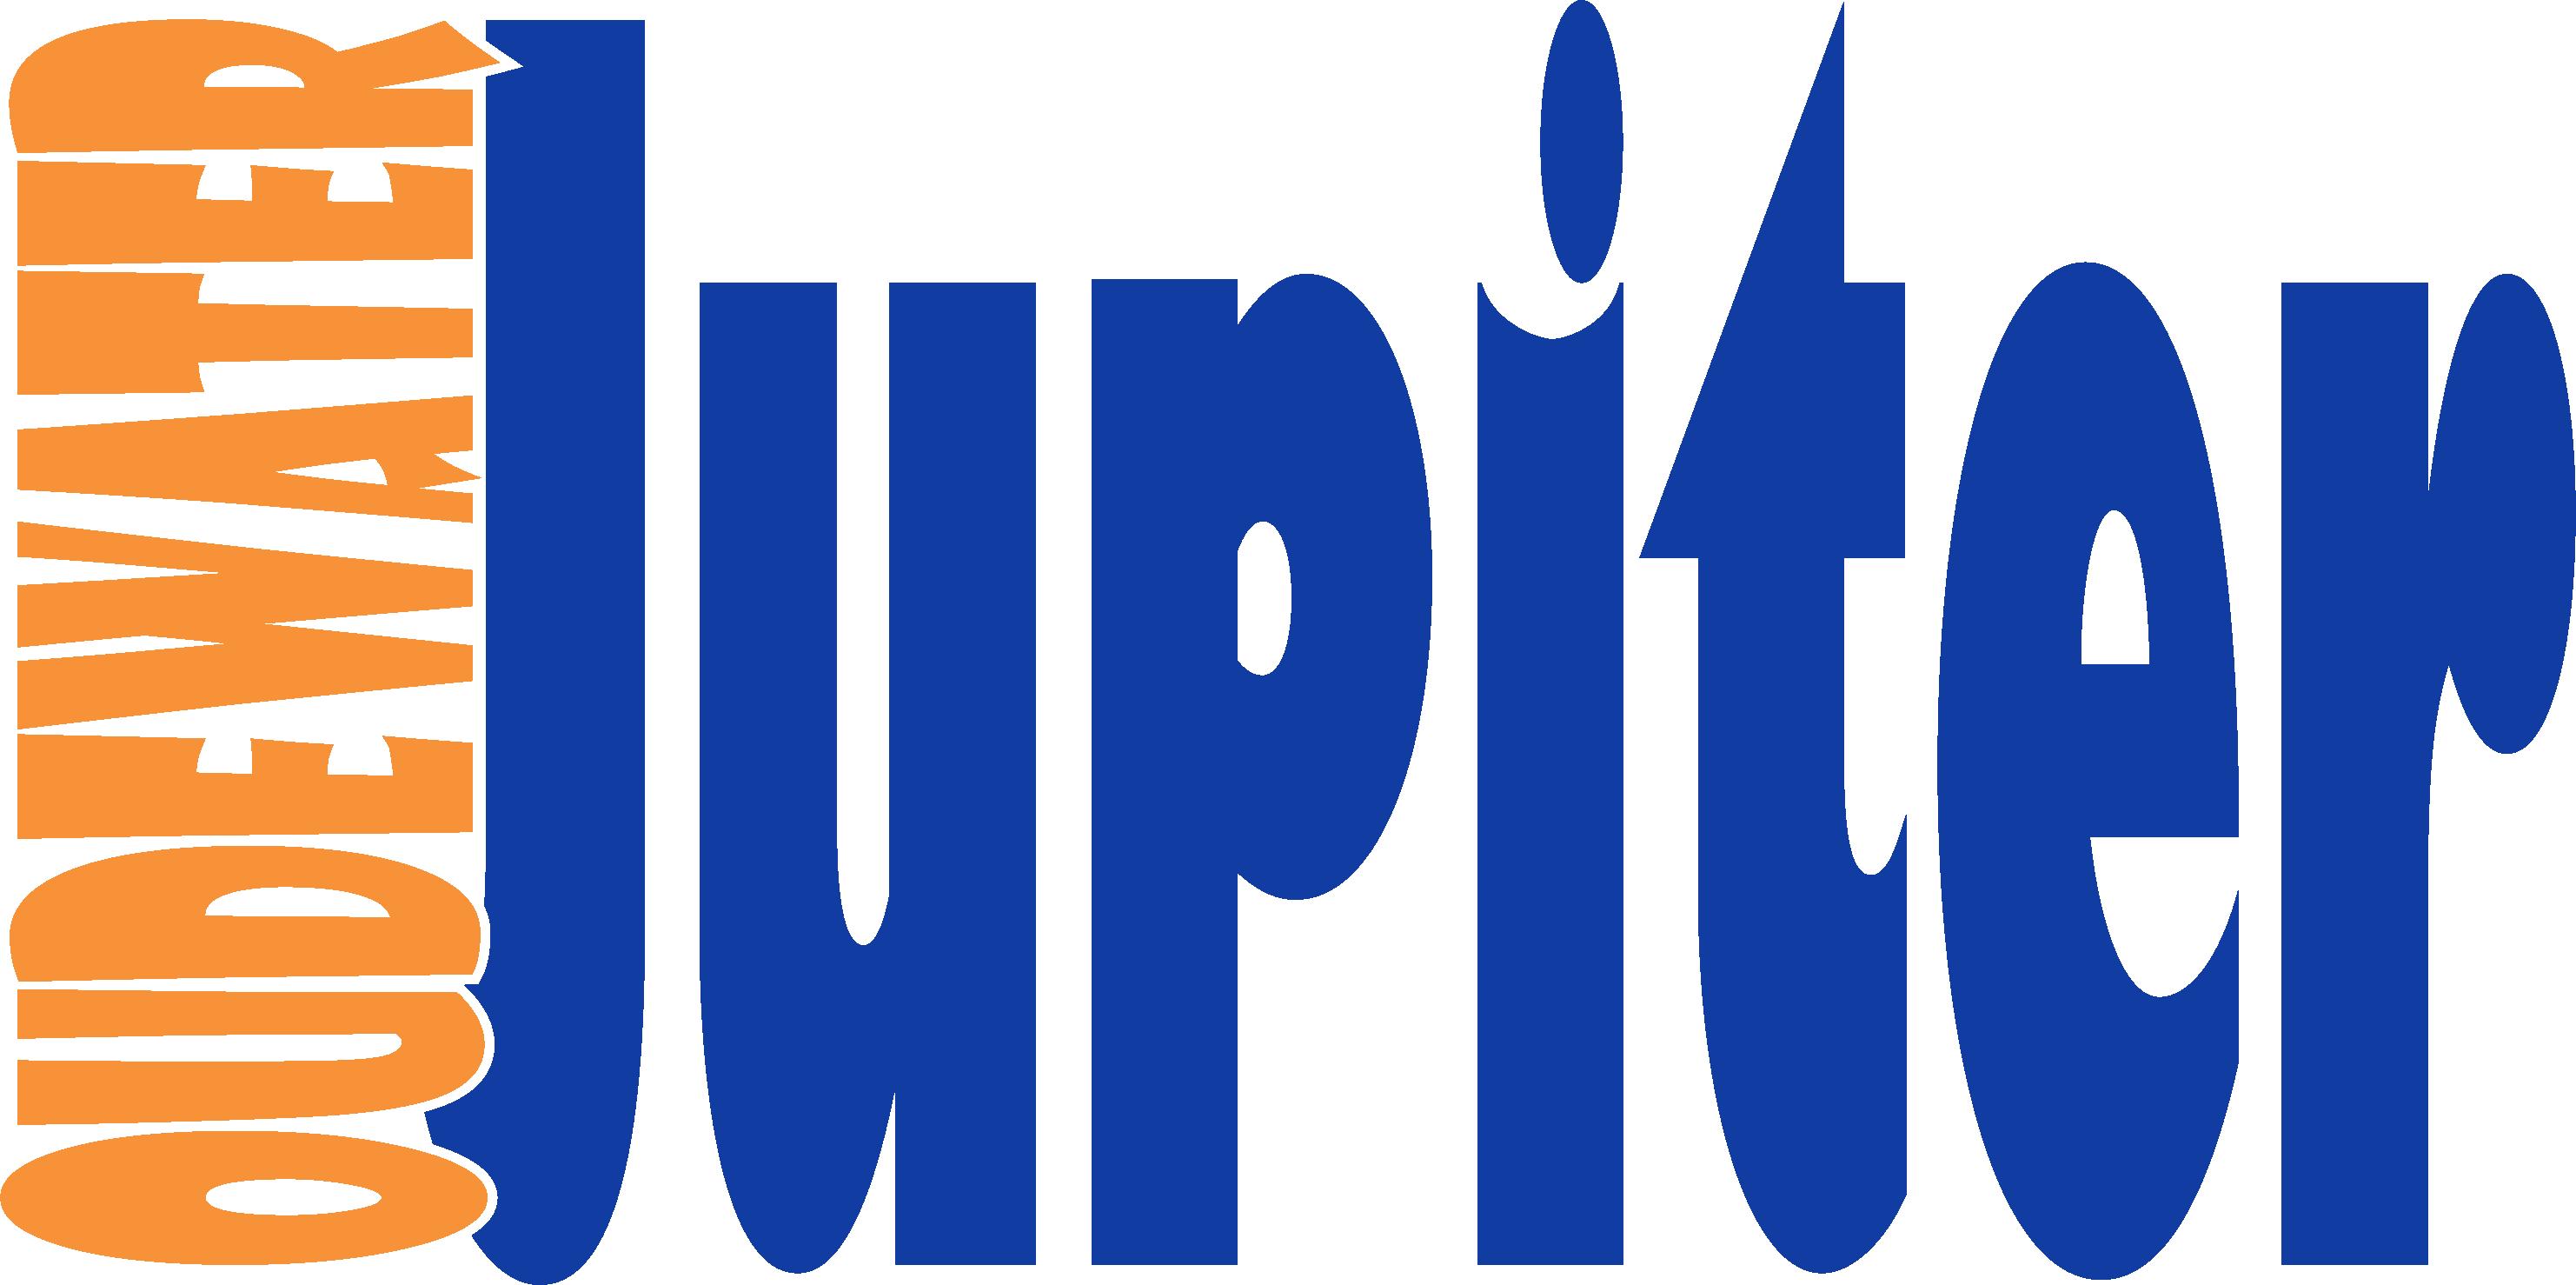 www.jupiteroudewater.nl